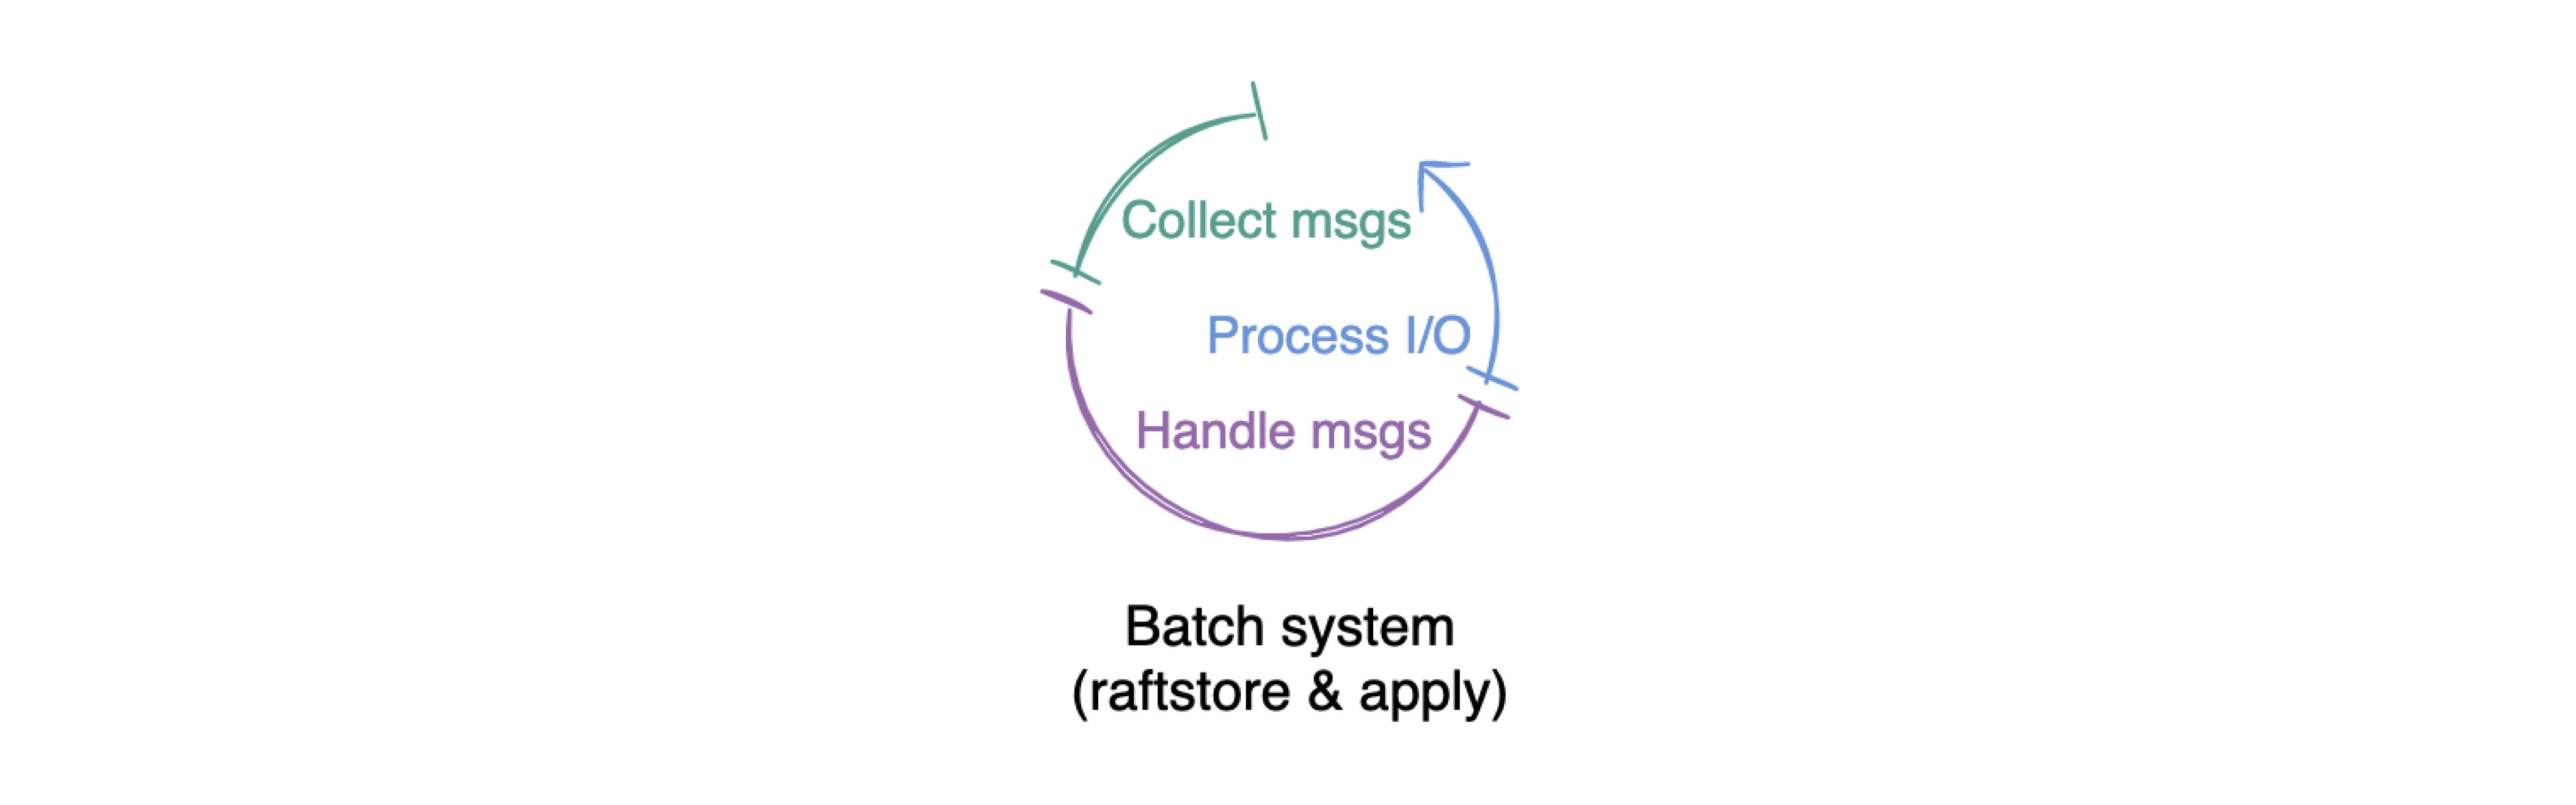 Batch system work pattern